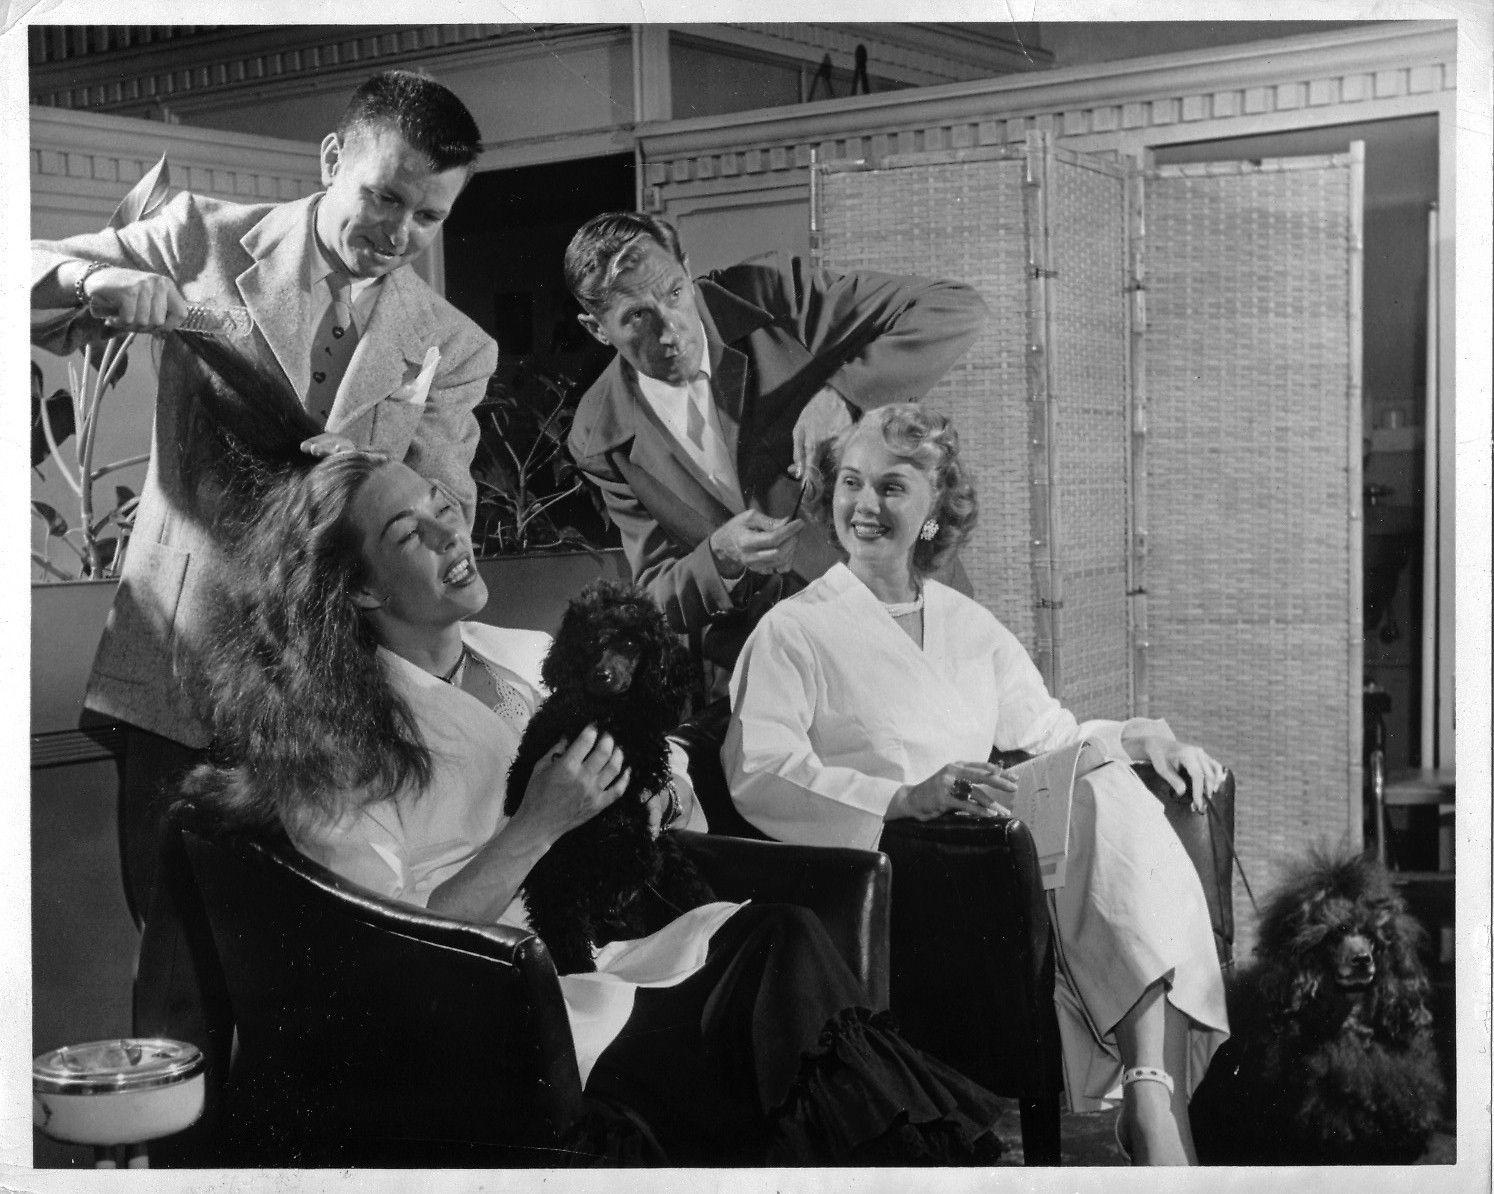 1950s beauty salon neato pinterest salons for 1950 beauty salon